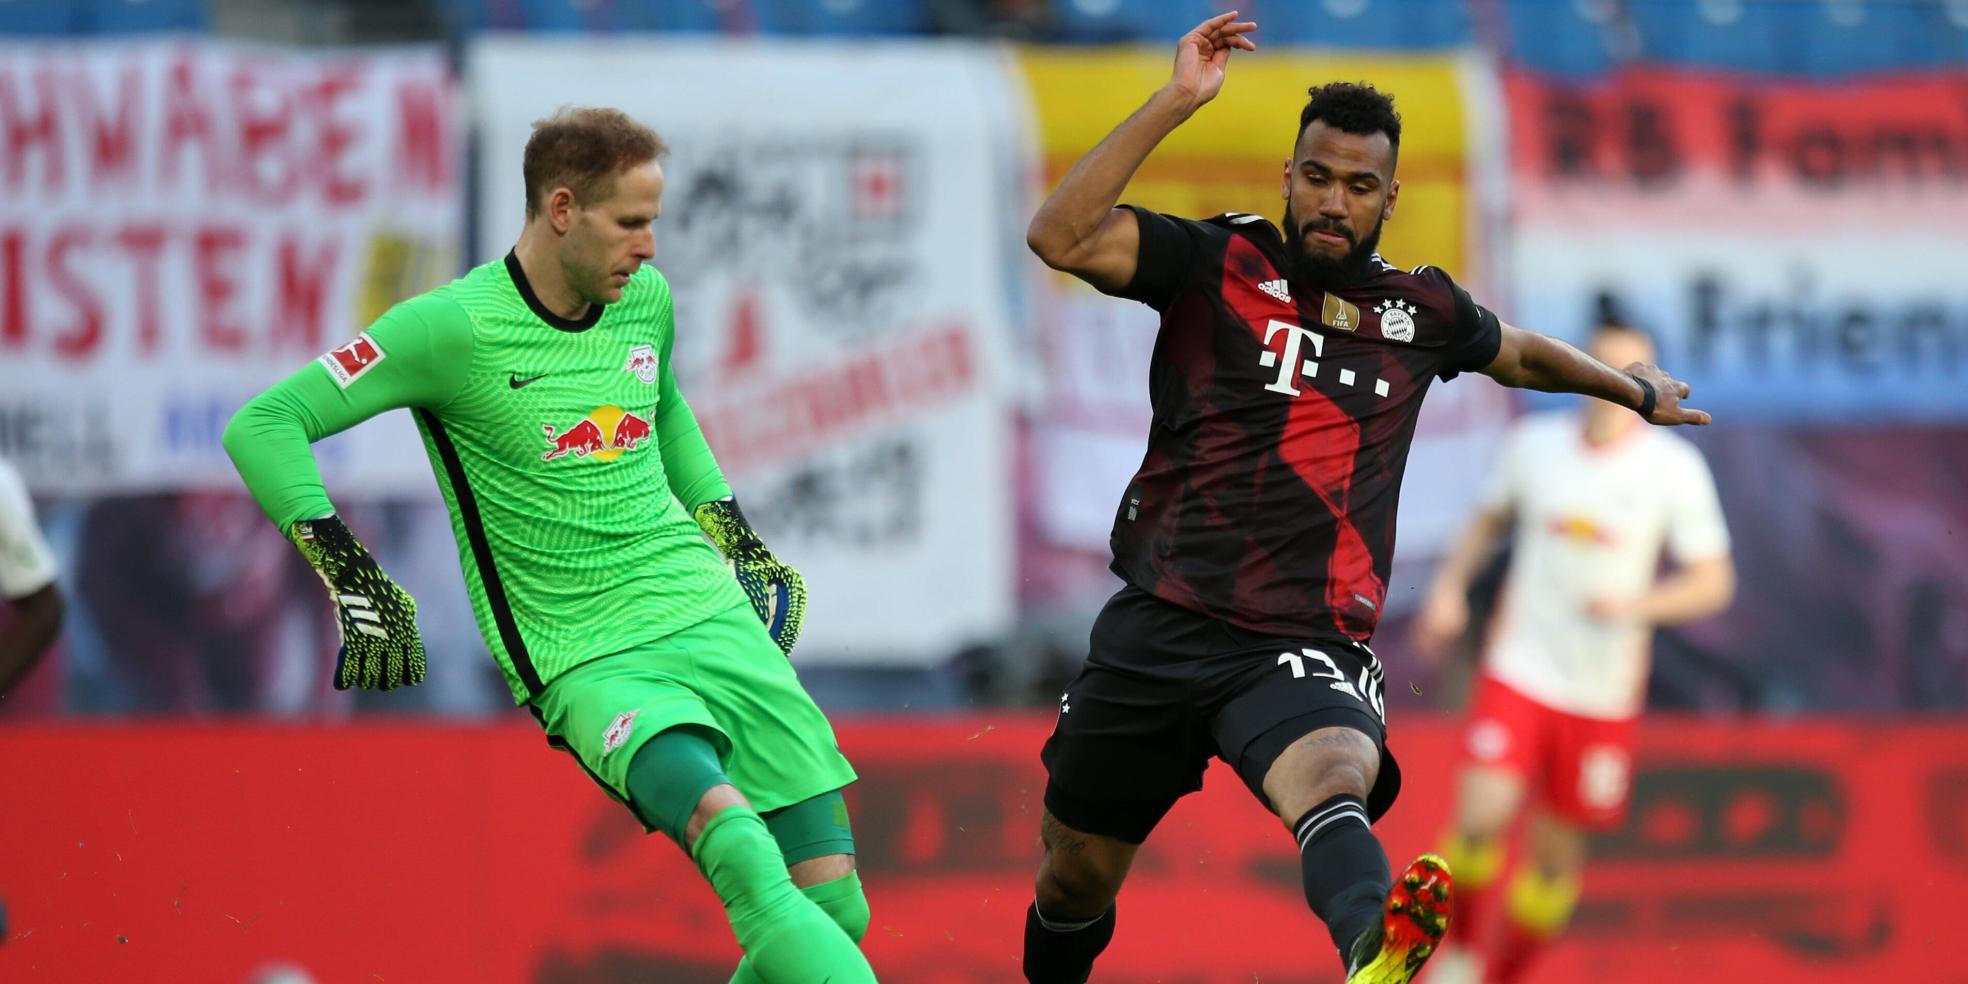 Eric-Maxim Choupo-Moting vom FC Bayern München